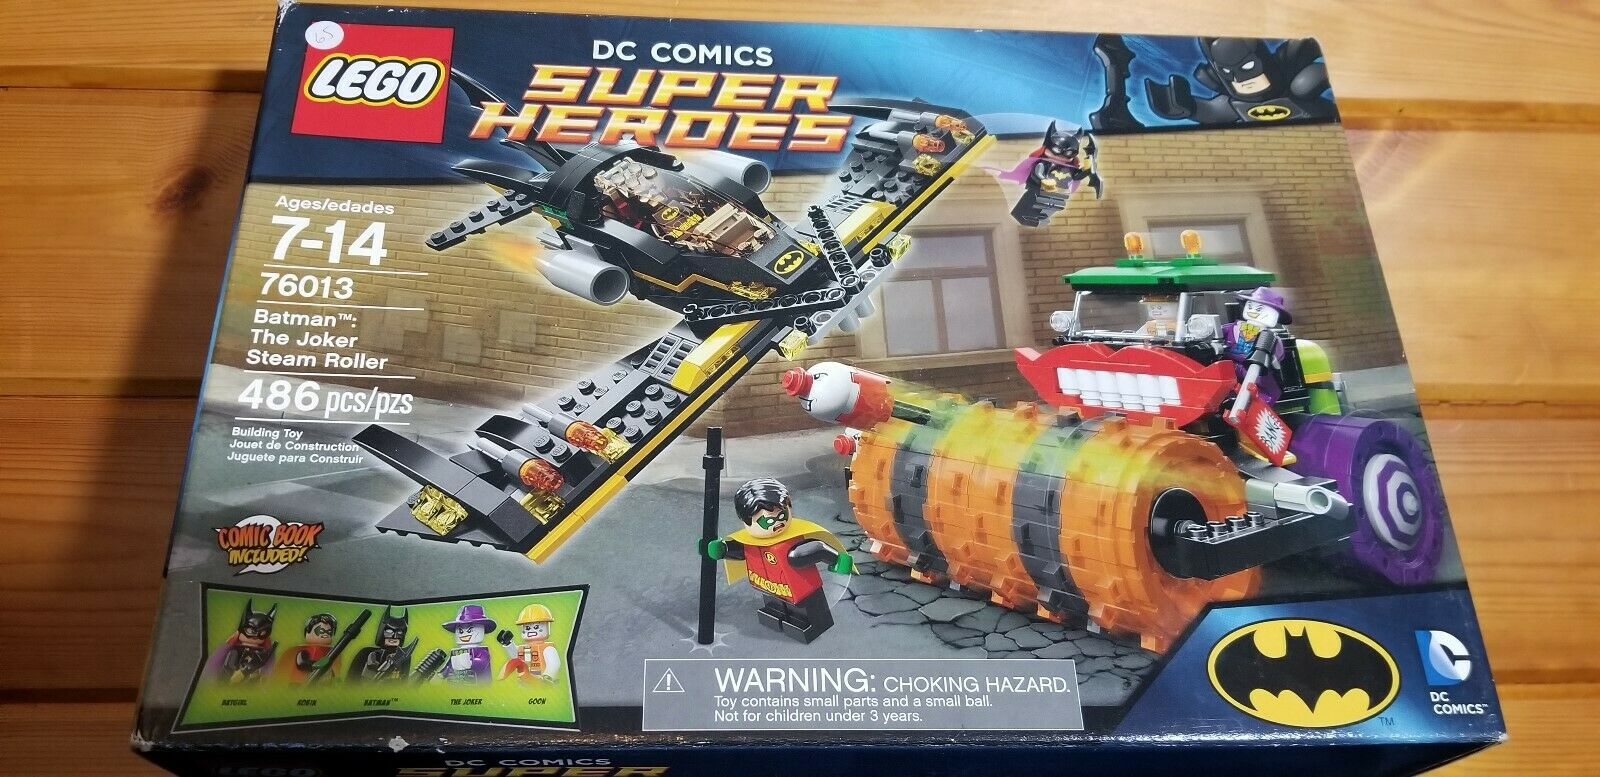 LEGO Super Heroes The Joker Minifigure Keychain 76013 Steamroller 6857 6863